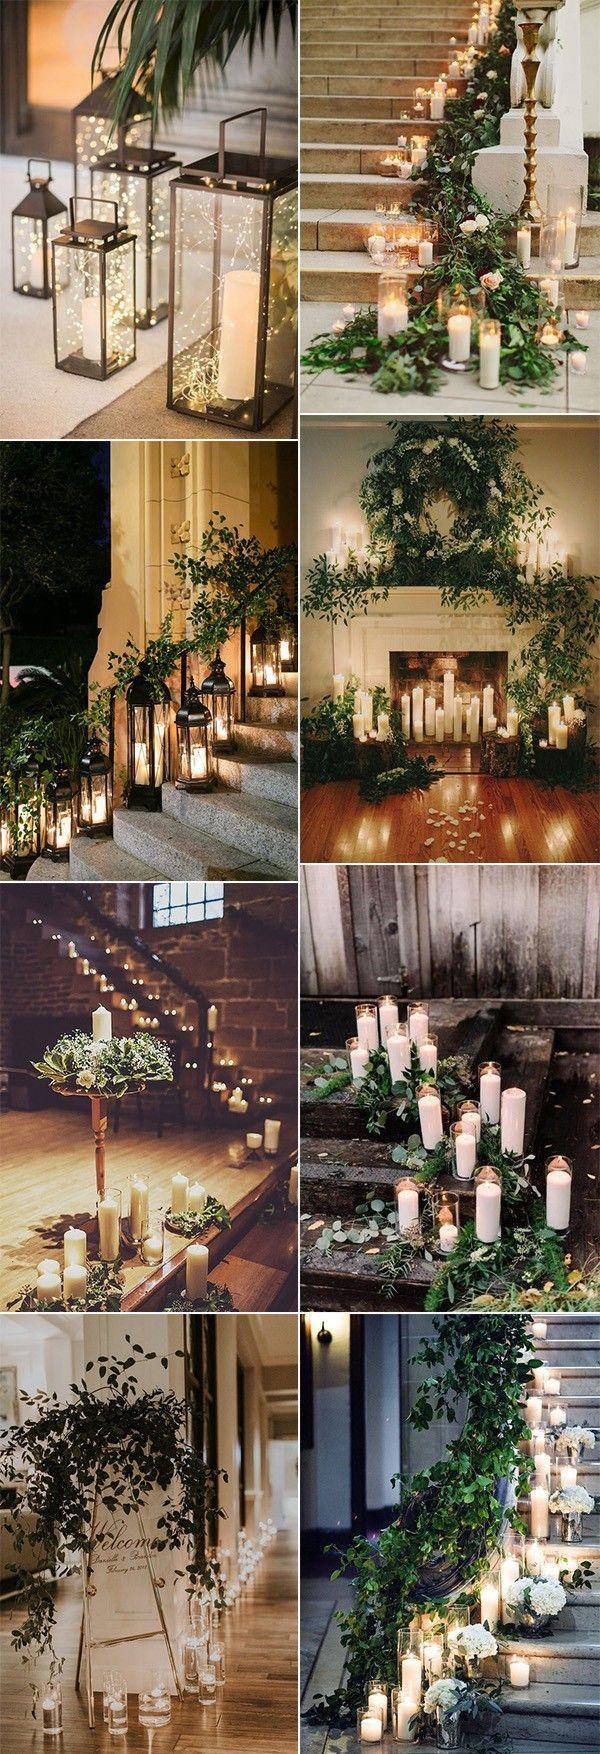 32 Whimsical Winter Wedding Decoration Ideas You'll Love – wedding